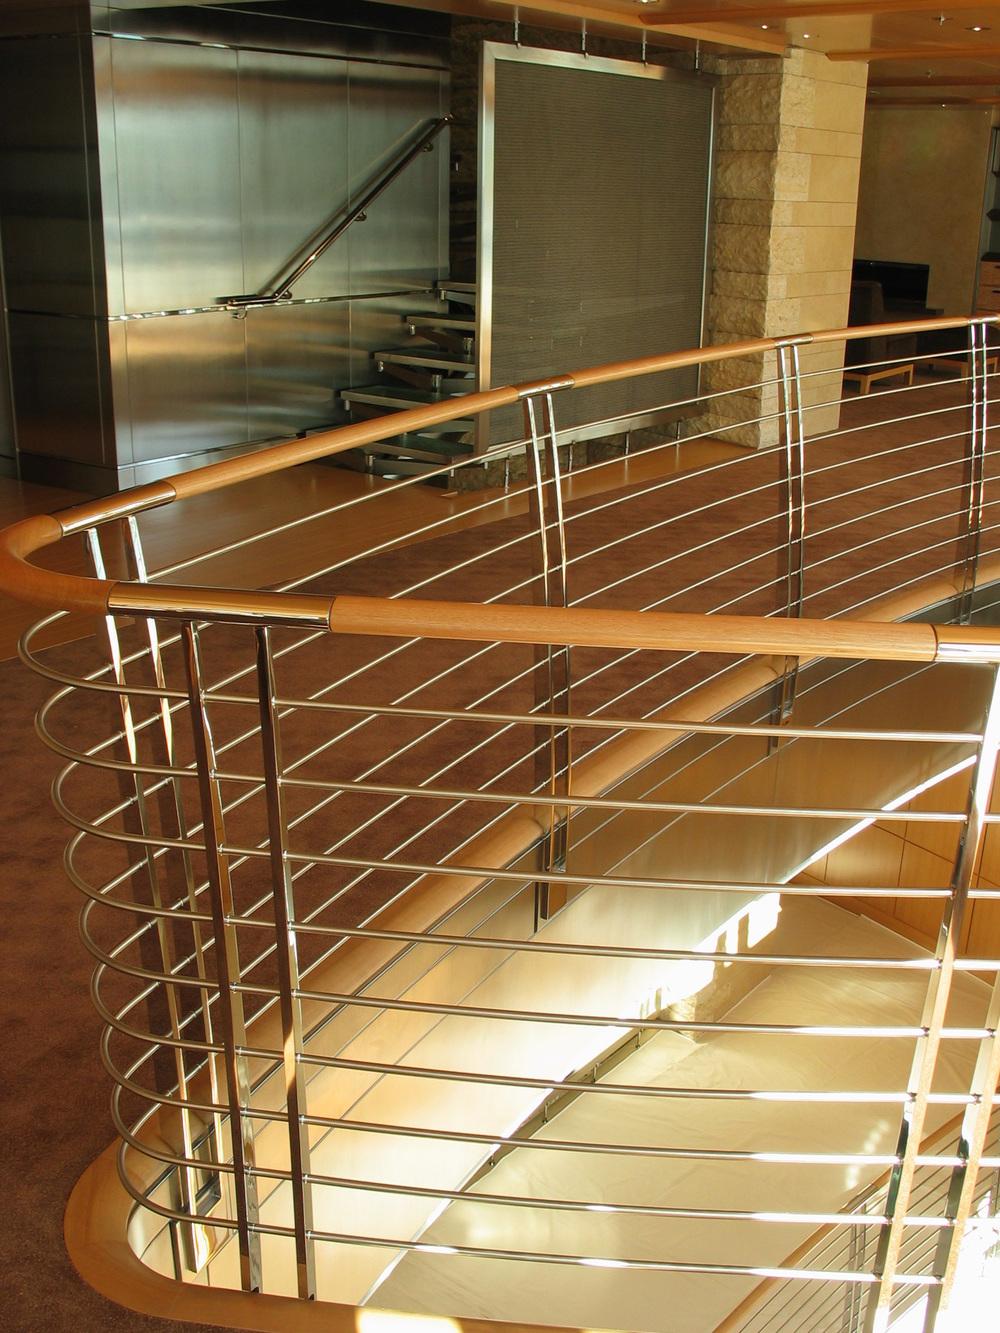 Motor Yacht 1 - Rising Sun - Stair Rail.jpg